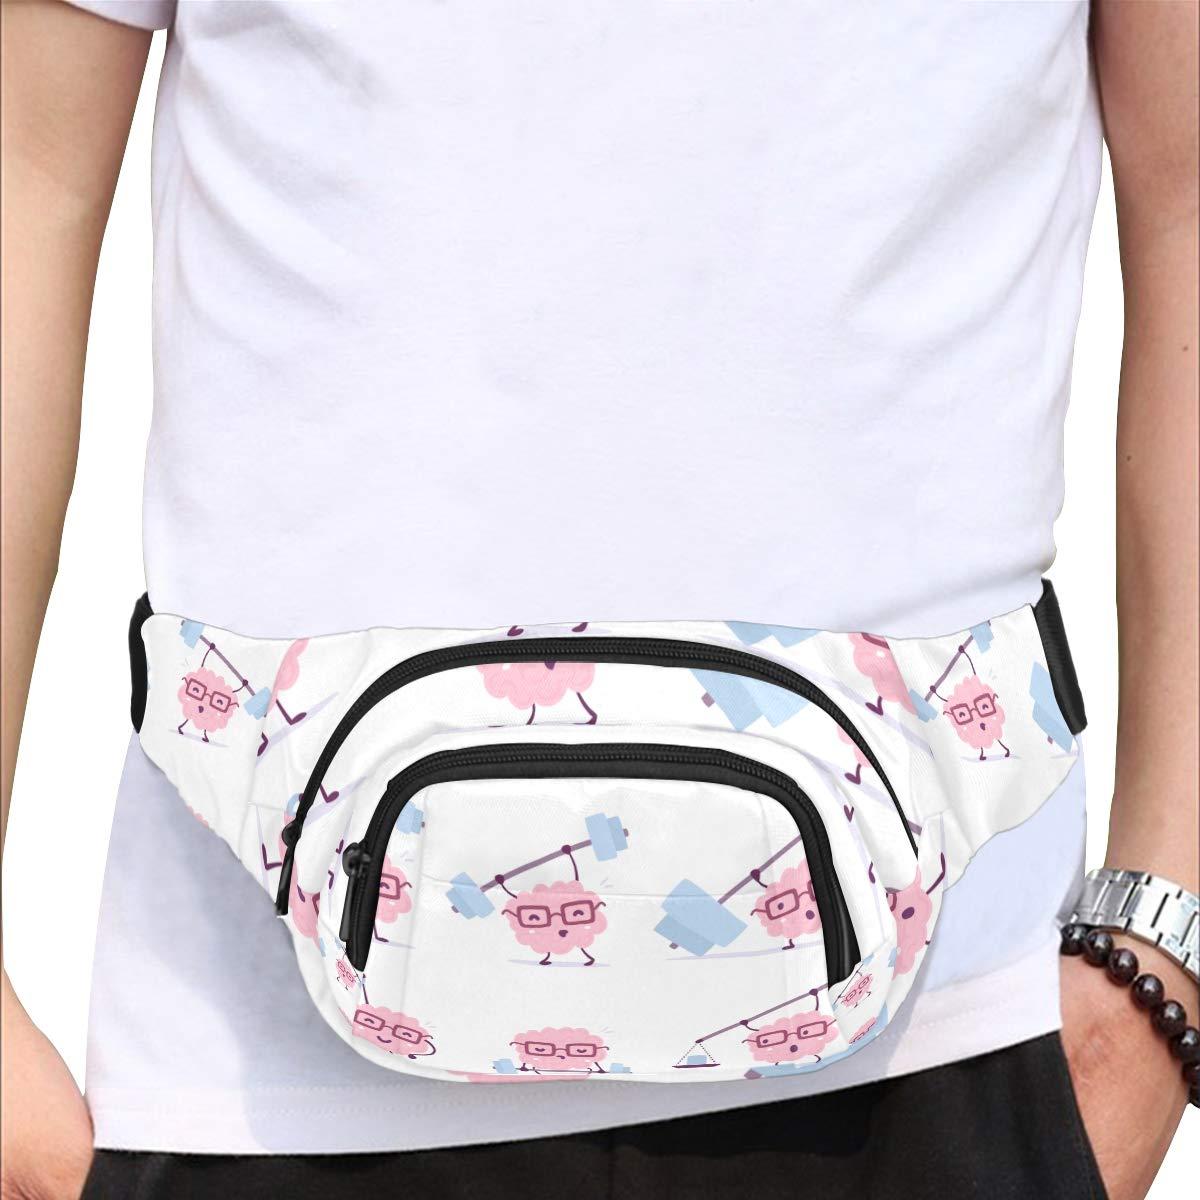 Animal Sporting With Barbell Fenny Packs Waist Bags Adjustable Belt Waterproof Nylon Travel Running Sport Vacation Party For Men Women Boys Girls Kids